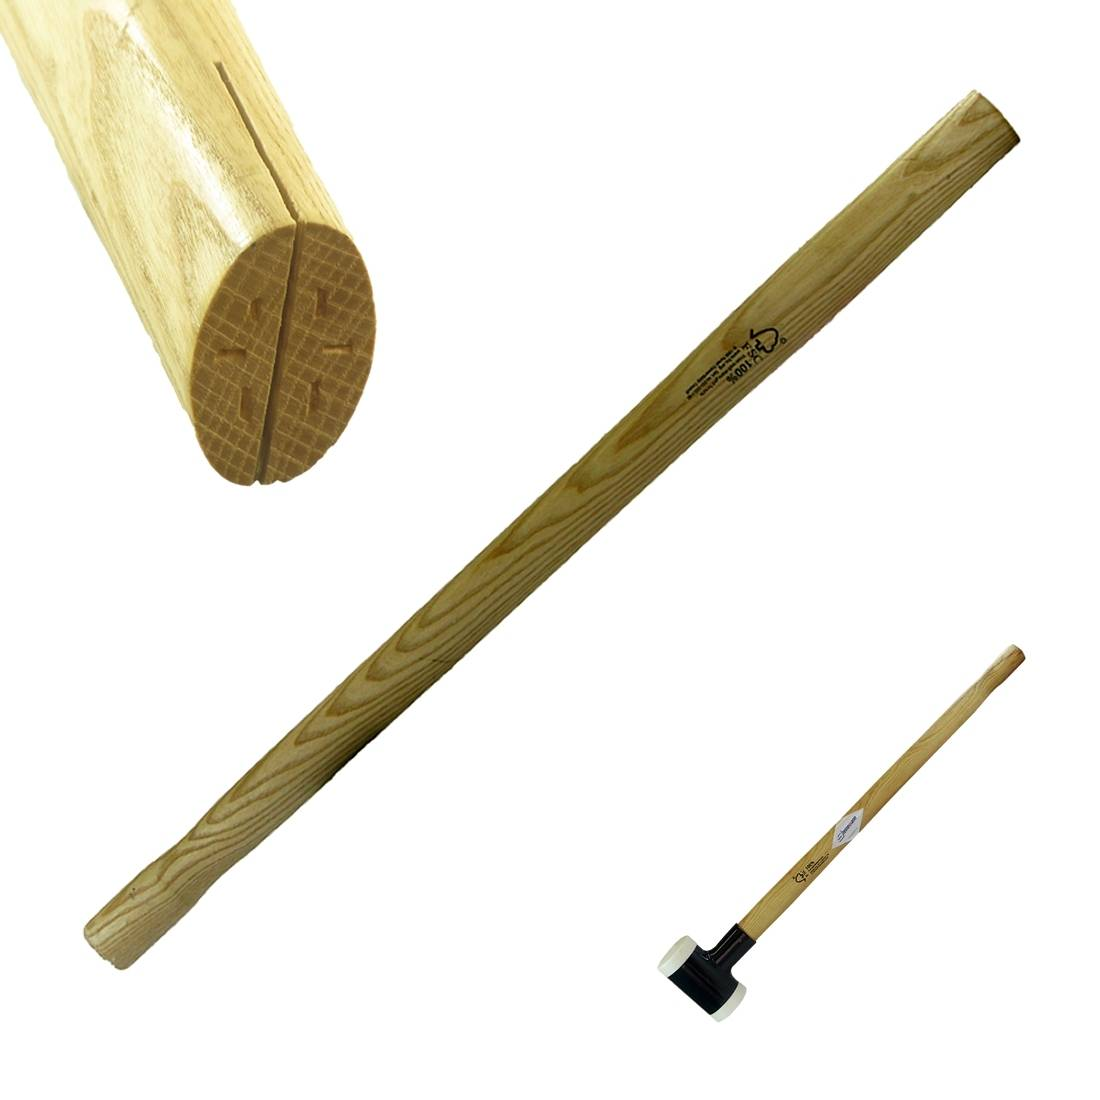 Schonhammer-Stiel 800 mm, Esche